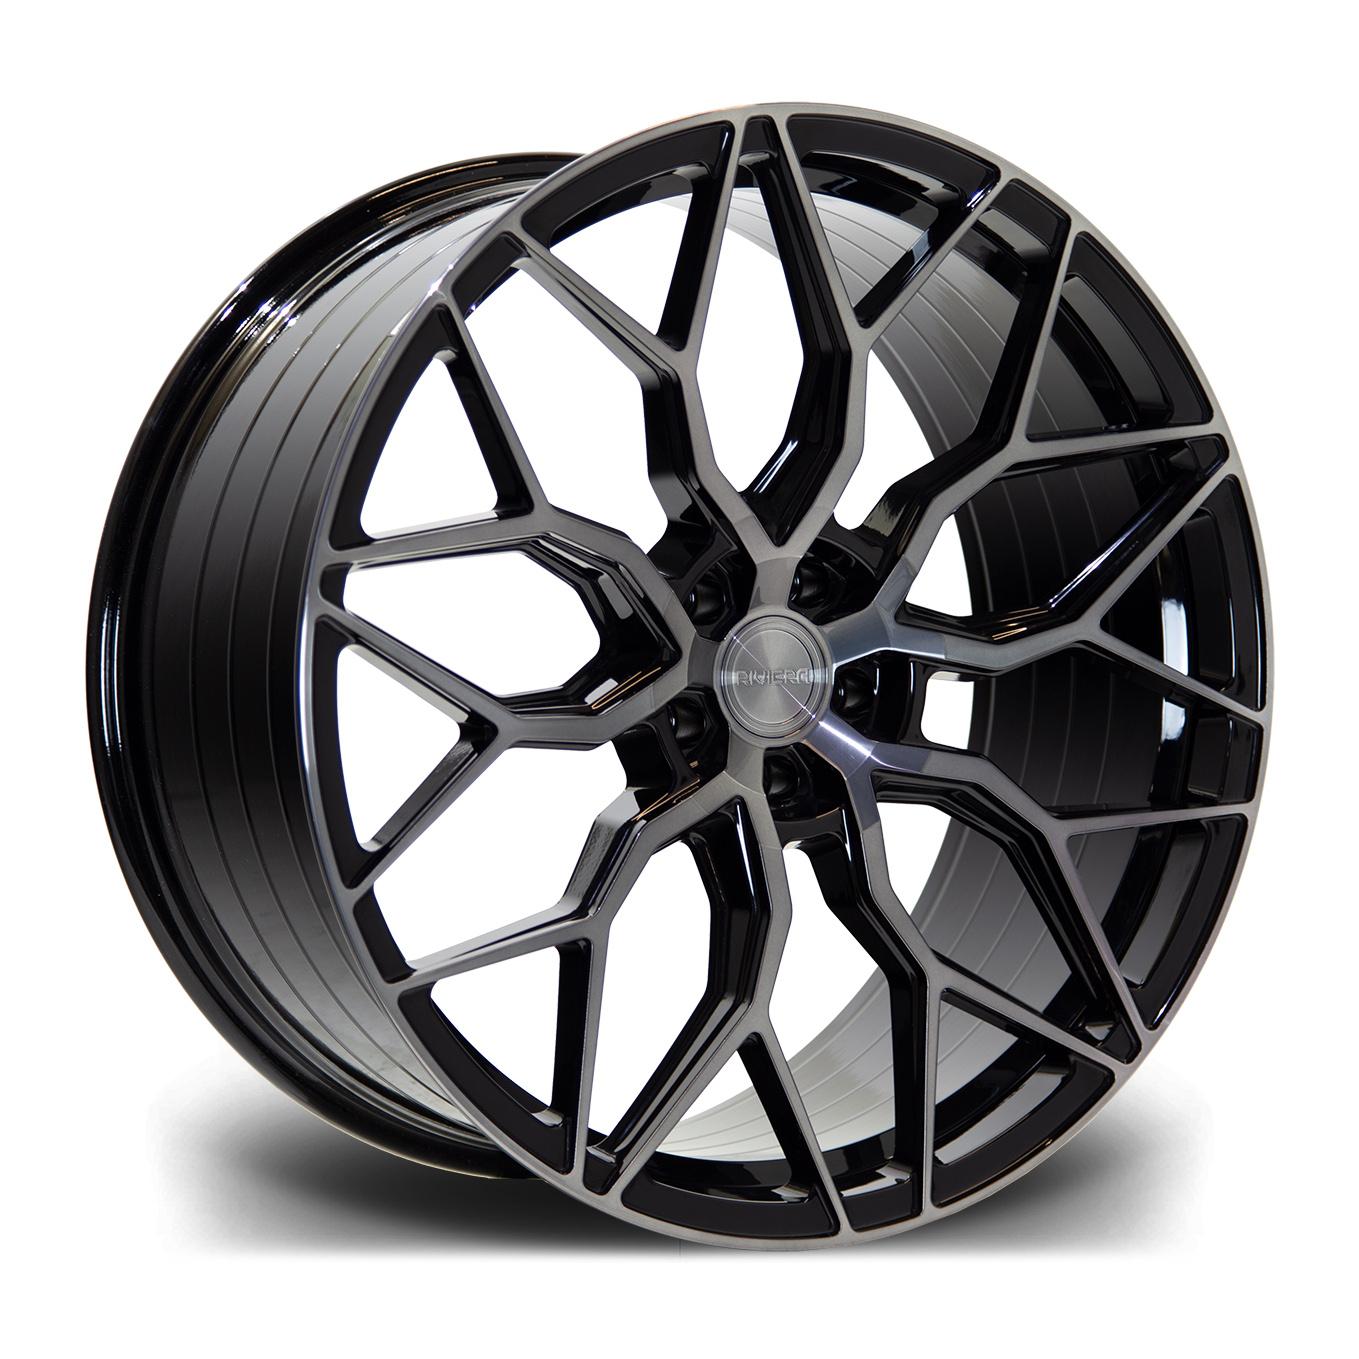 Cerchi in lega  Riviera  RF108  20''  Width 8.5   5X120  ET 35  CB 72.5    Black Polished Dtint